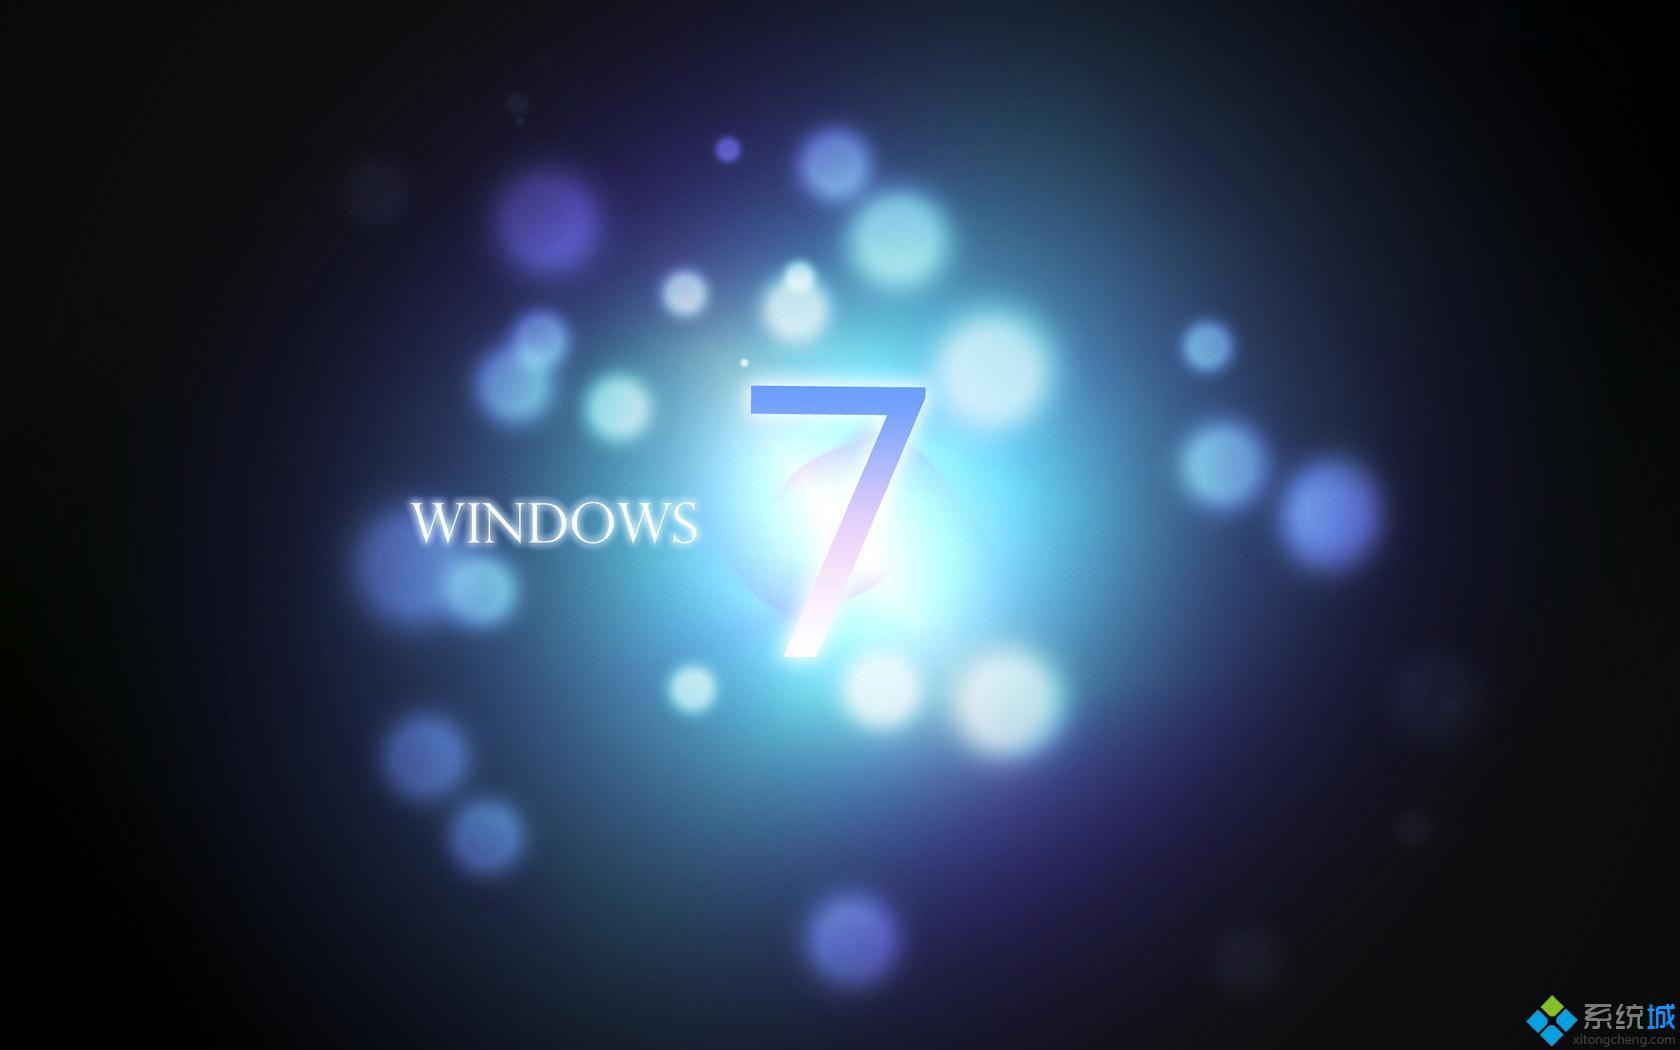 win7系统电脑安装双系统后需要启动两次才能进入的解决方法